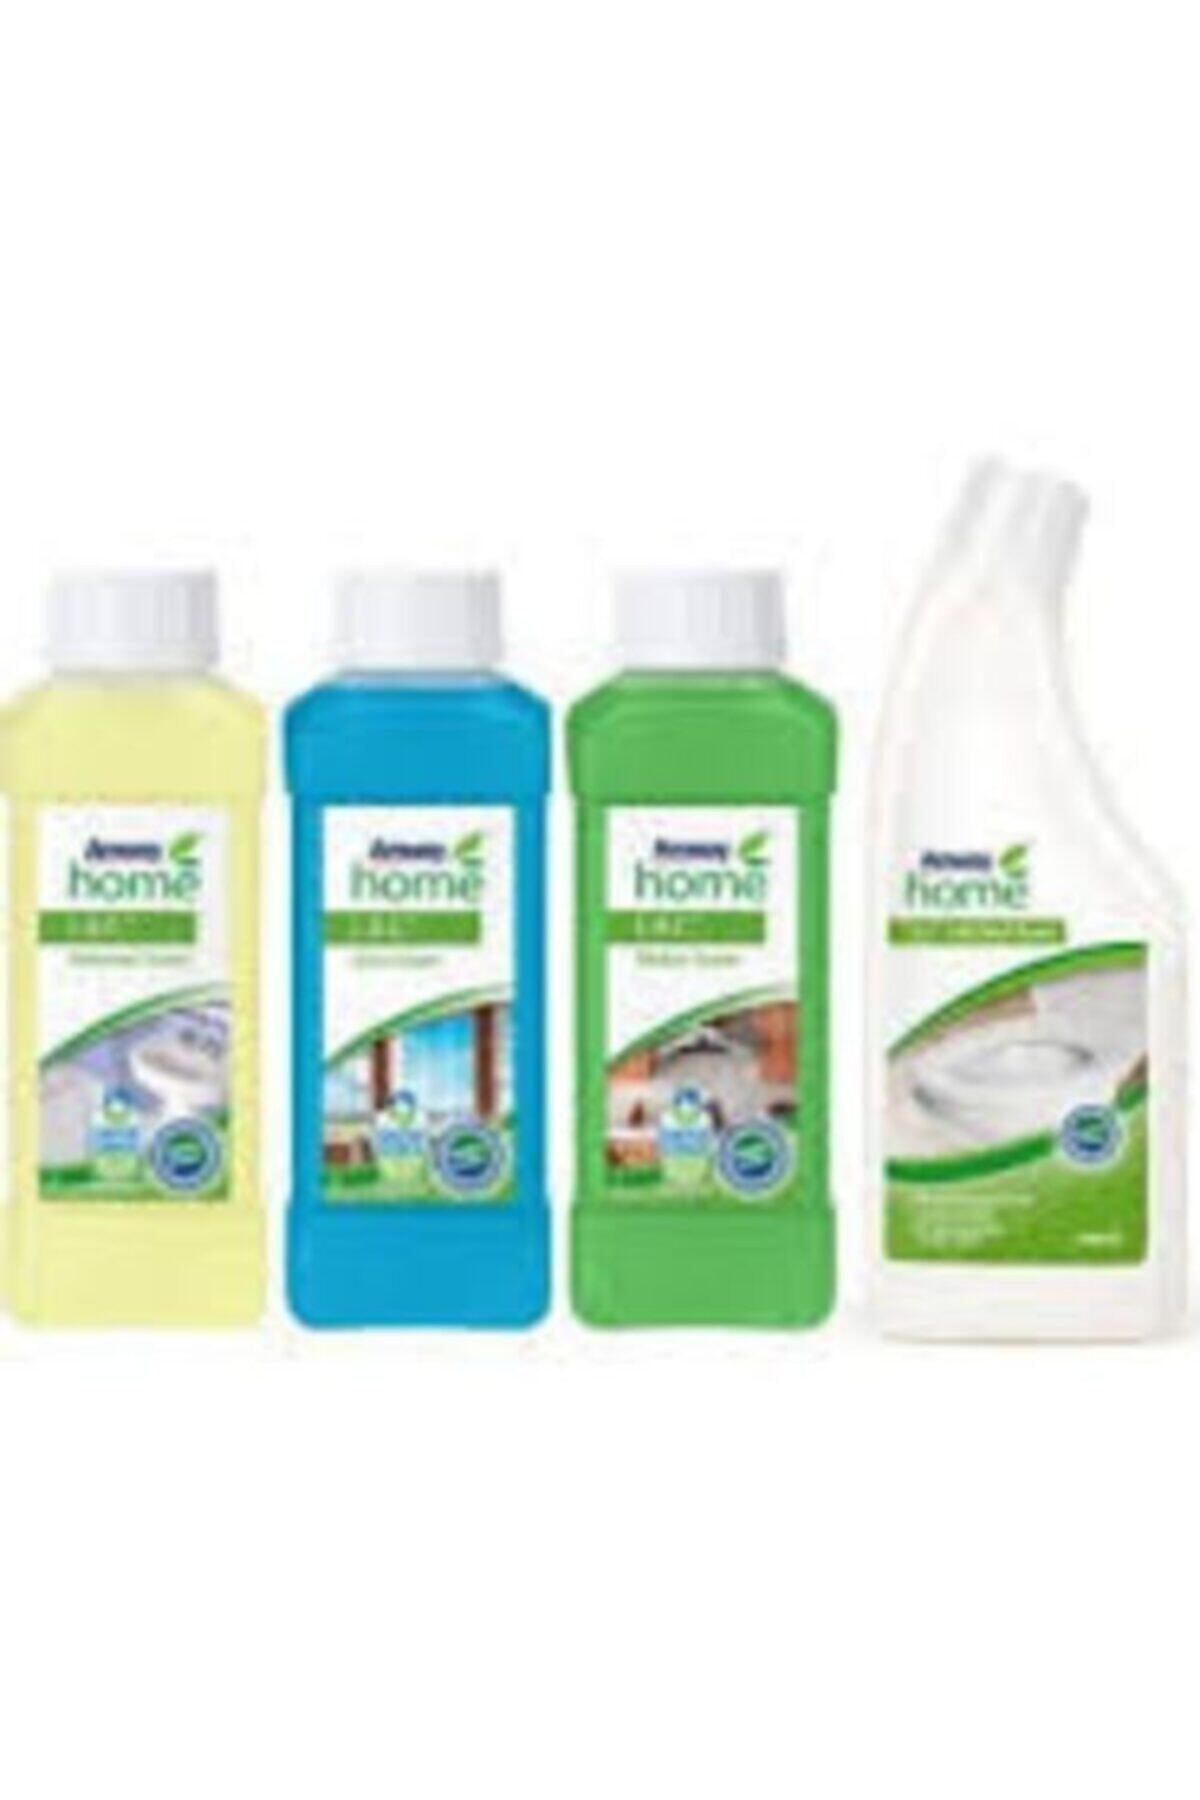 Amway Mutfak Temizleyici Home™ L.o.c.™toilet Bowl Cleaner -tuvalet Temizleyicisi Home™ L.o.c.™ 1